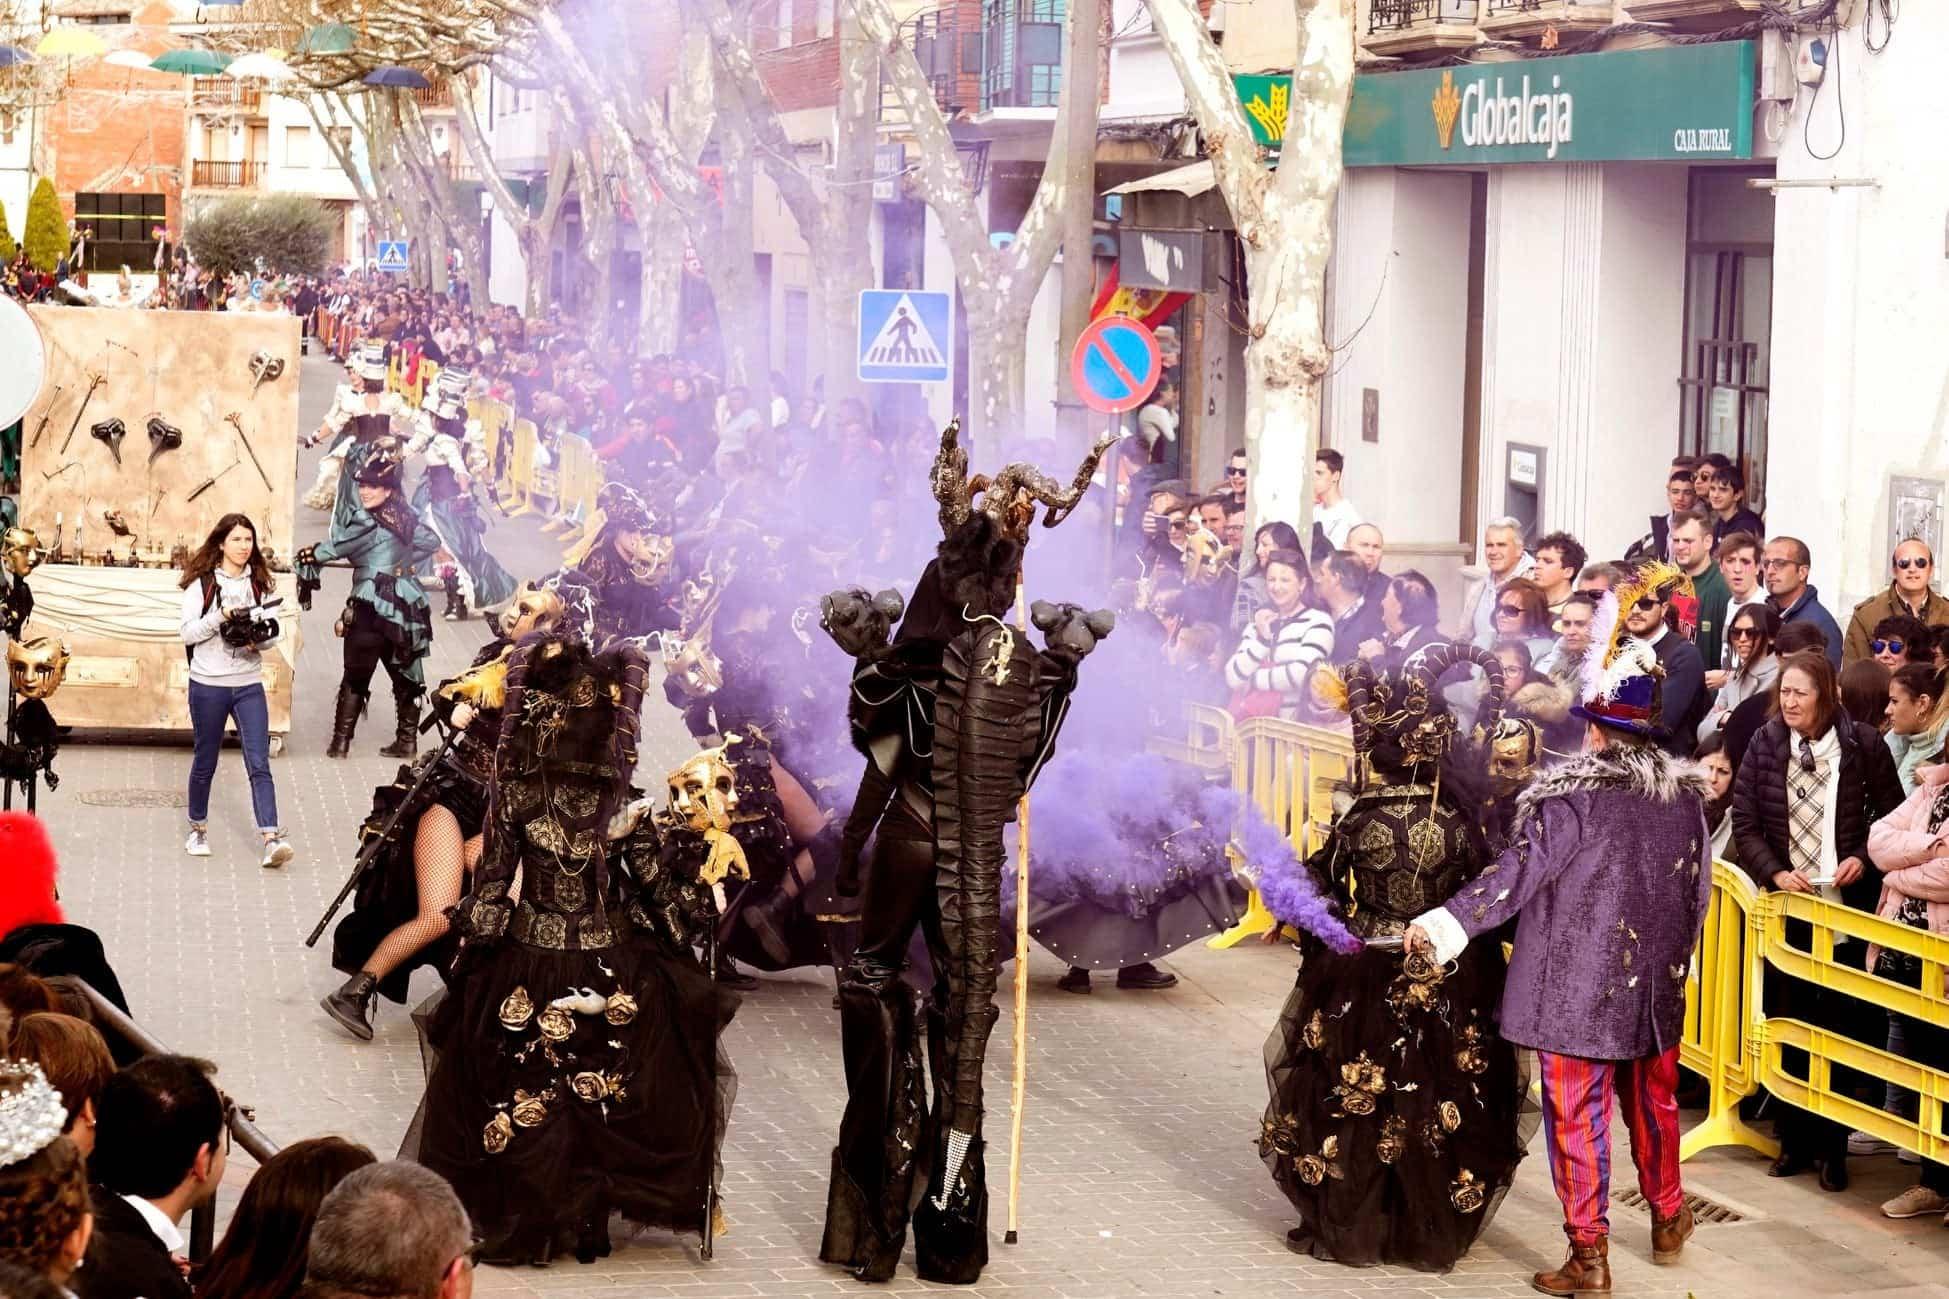 Carnaval de herencia 2020 ofertorio 55 - Selección de fotografías del Ofertorio del Carnaval de Herencia